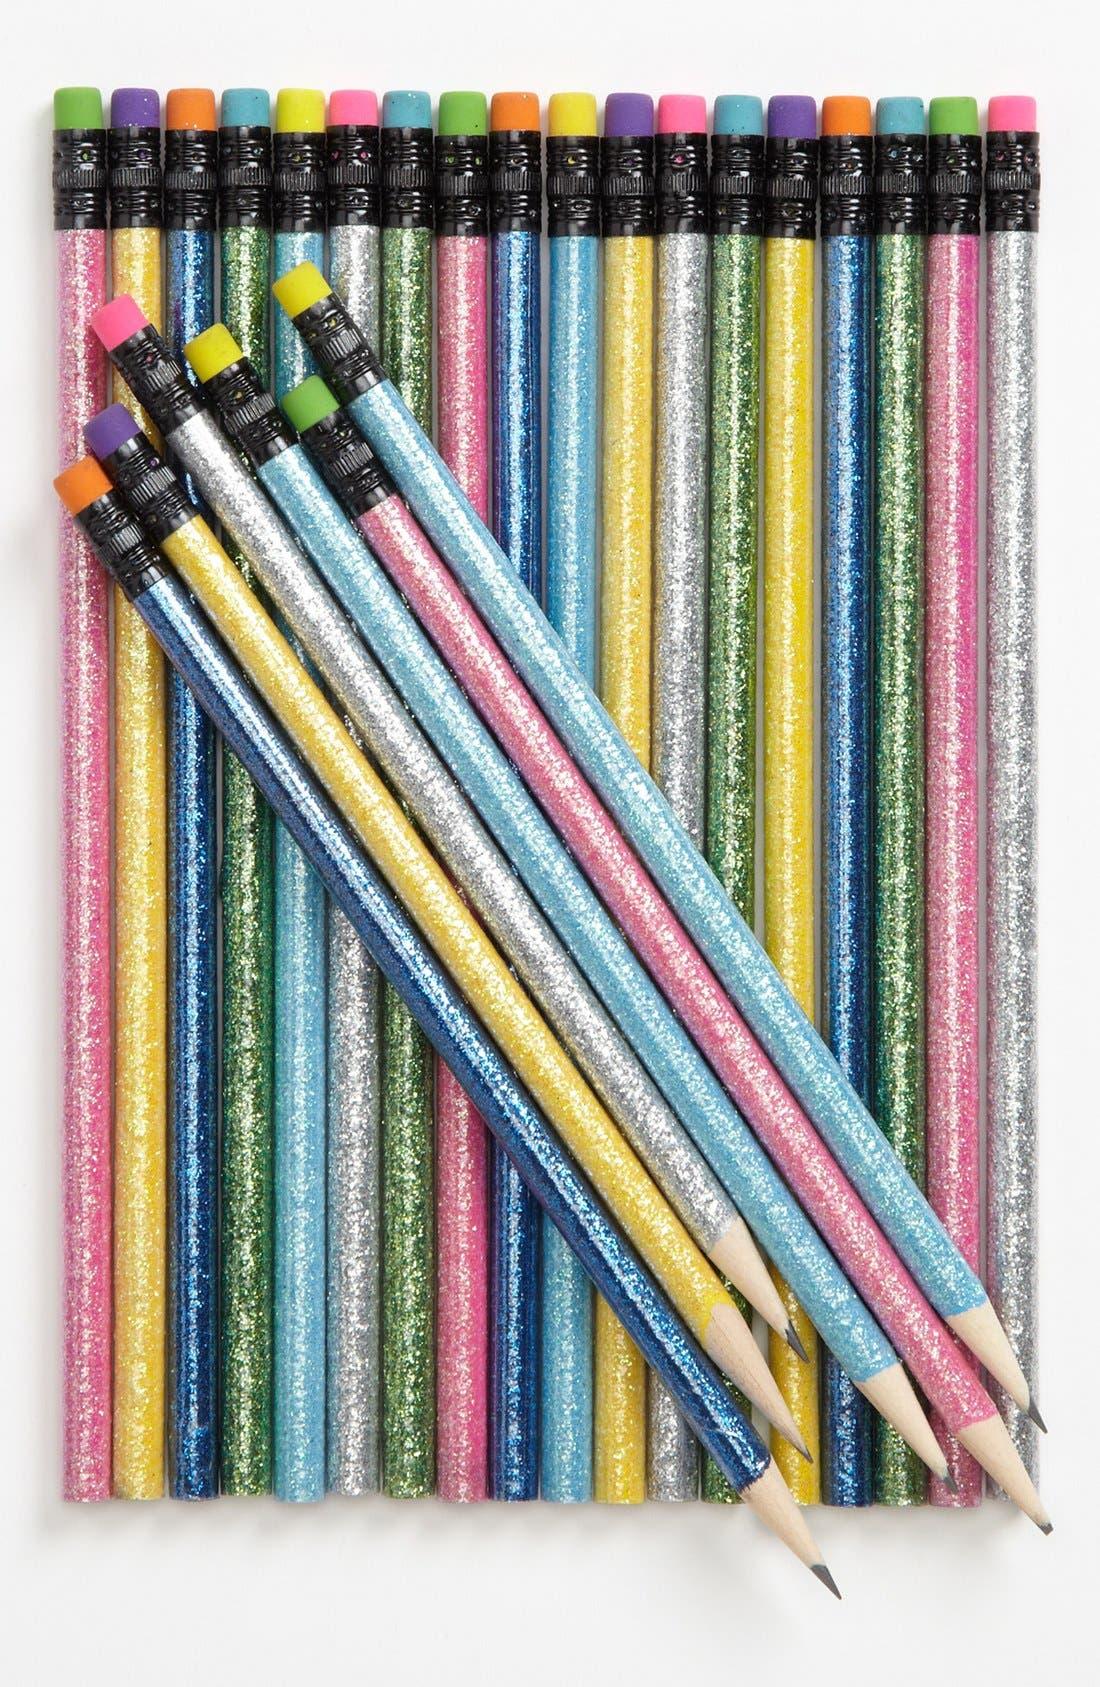 Alternate Image 1 Selected - International Arrivals 'Twinkle Twinkle' Pencils (Set of 24) (Girls)